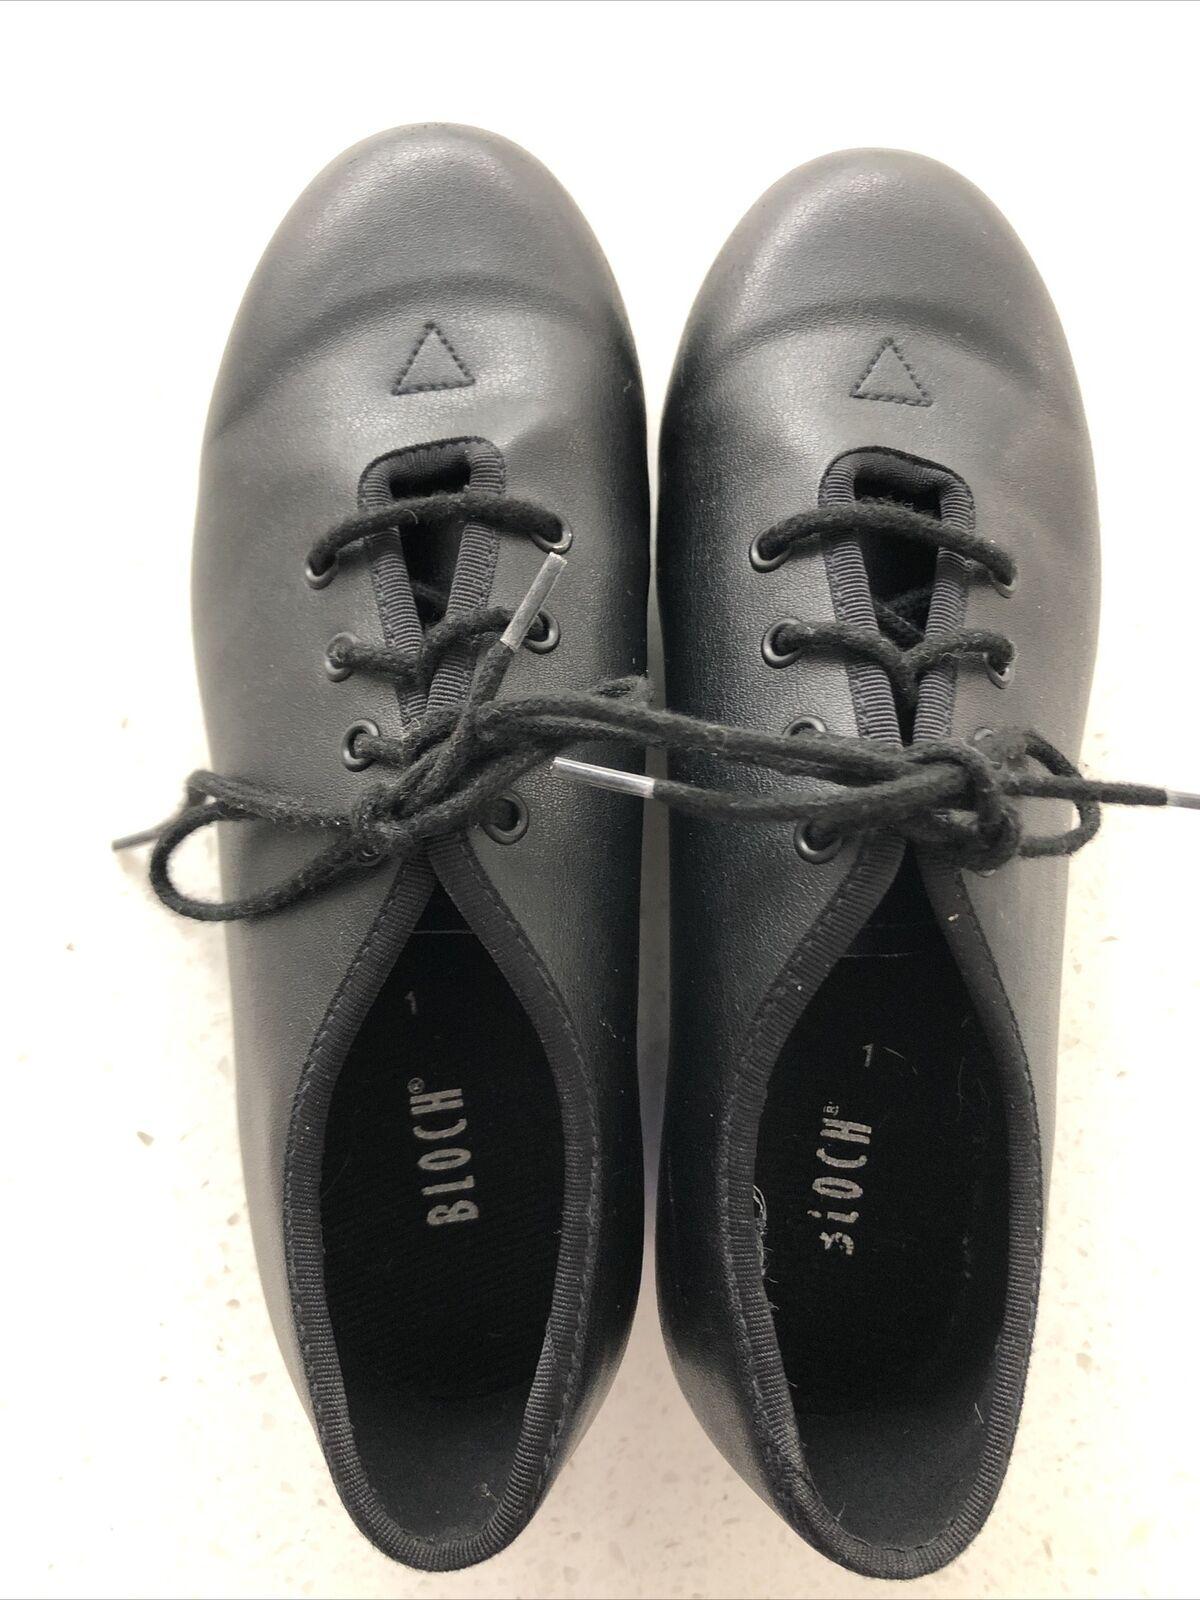 BLOCH Jazz Tap Leather Tap Shoes Black Size UK 1 Excellent Condition.